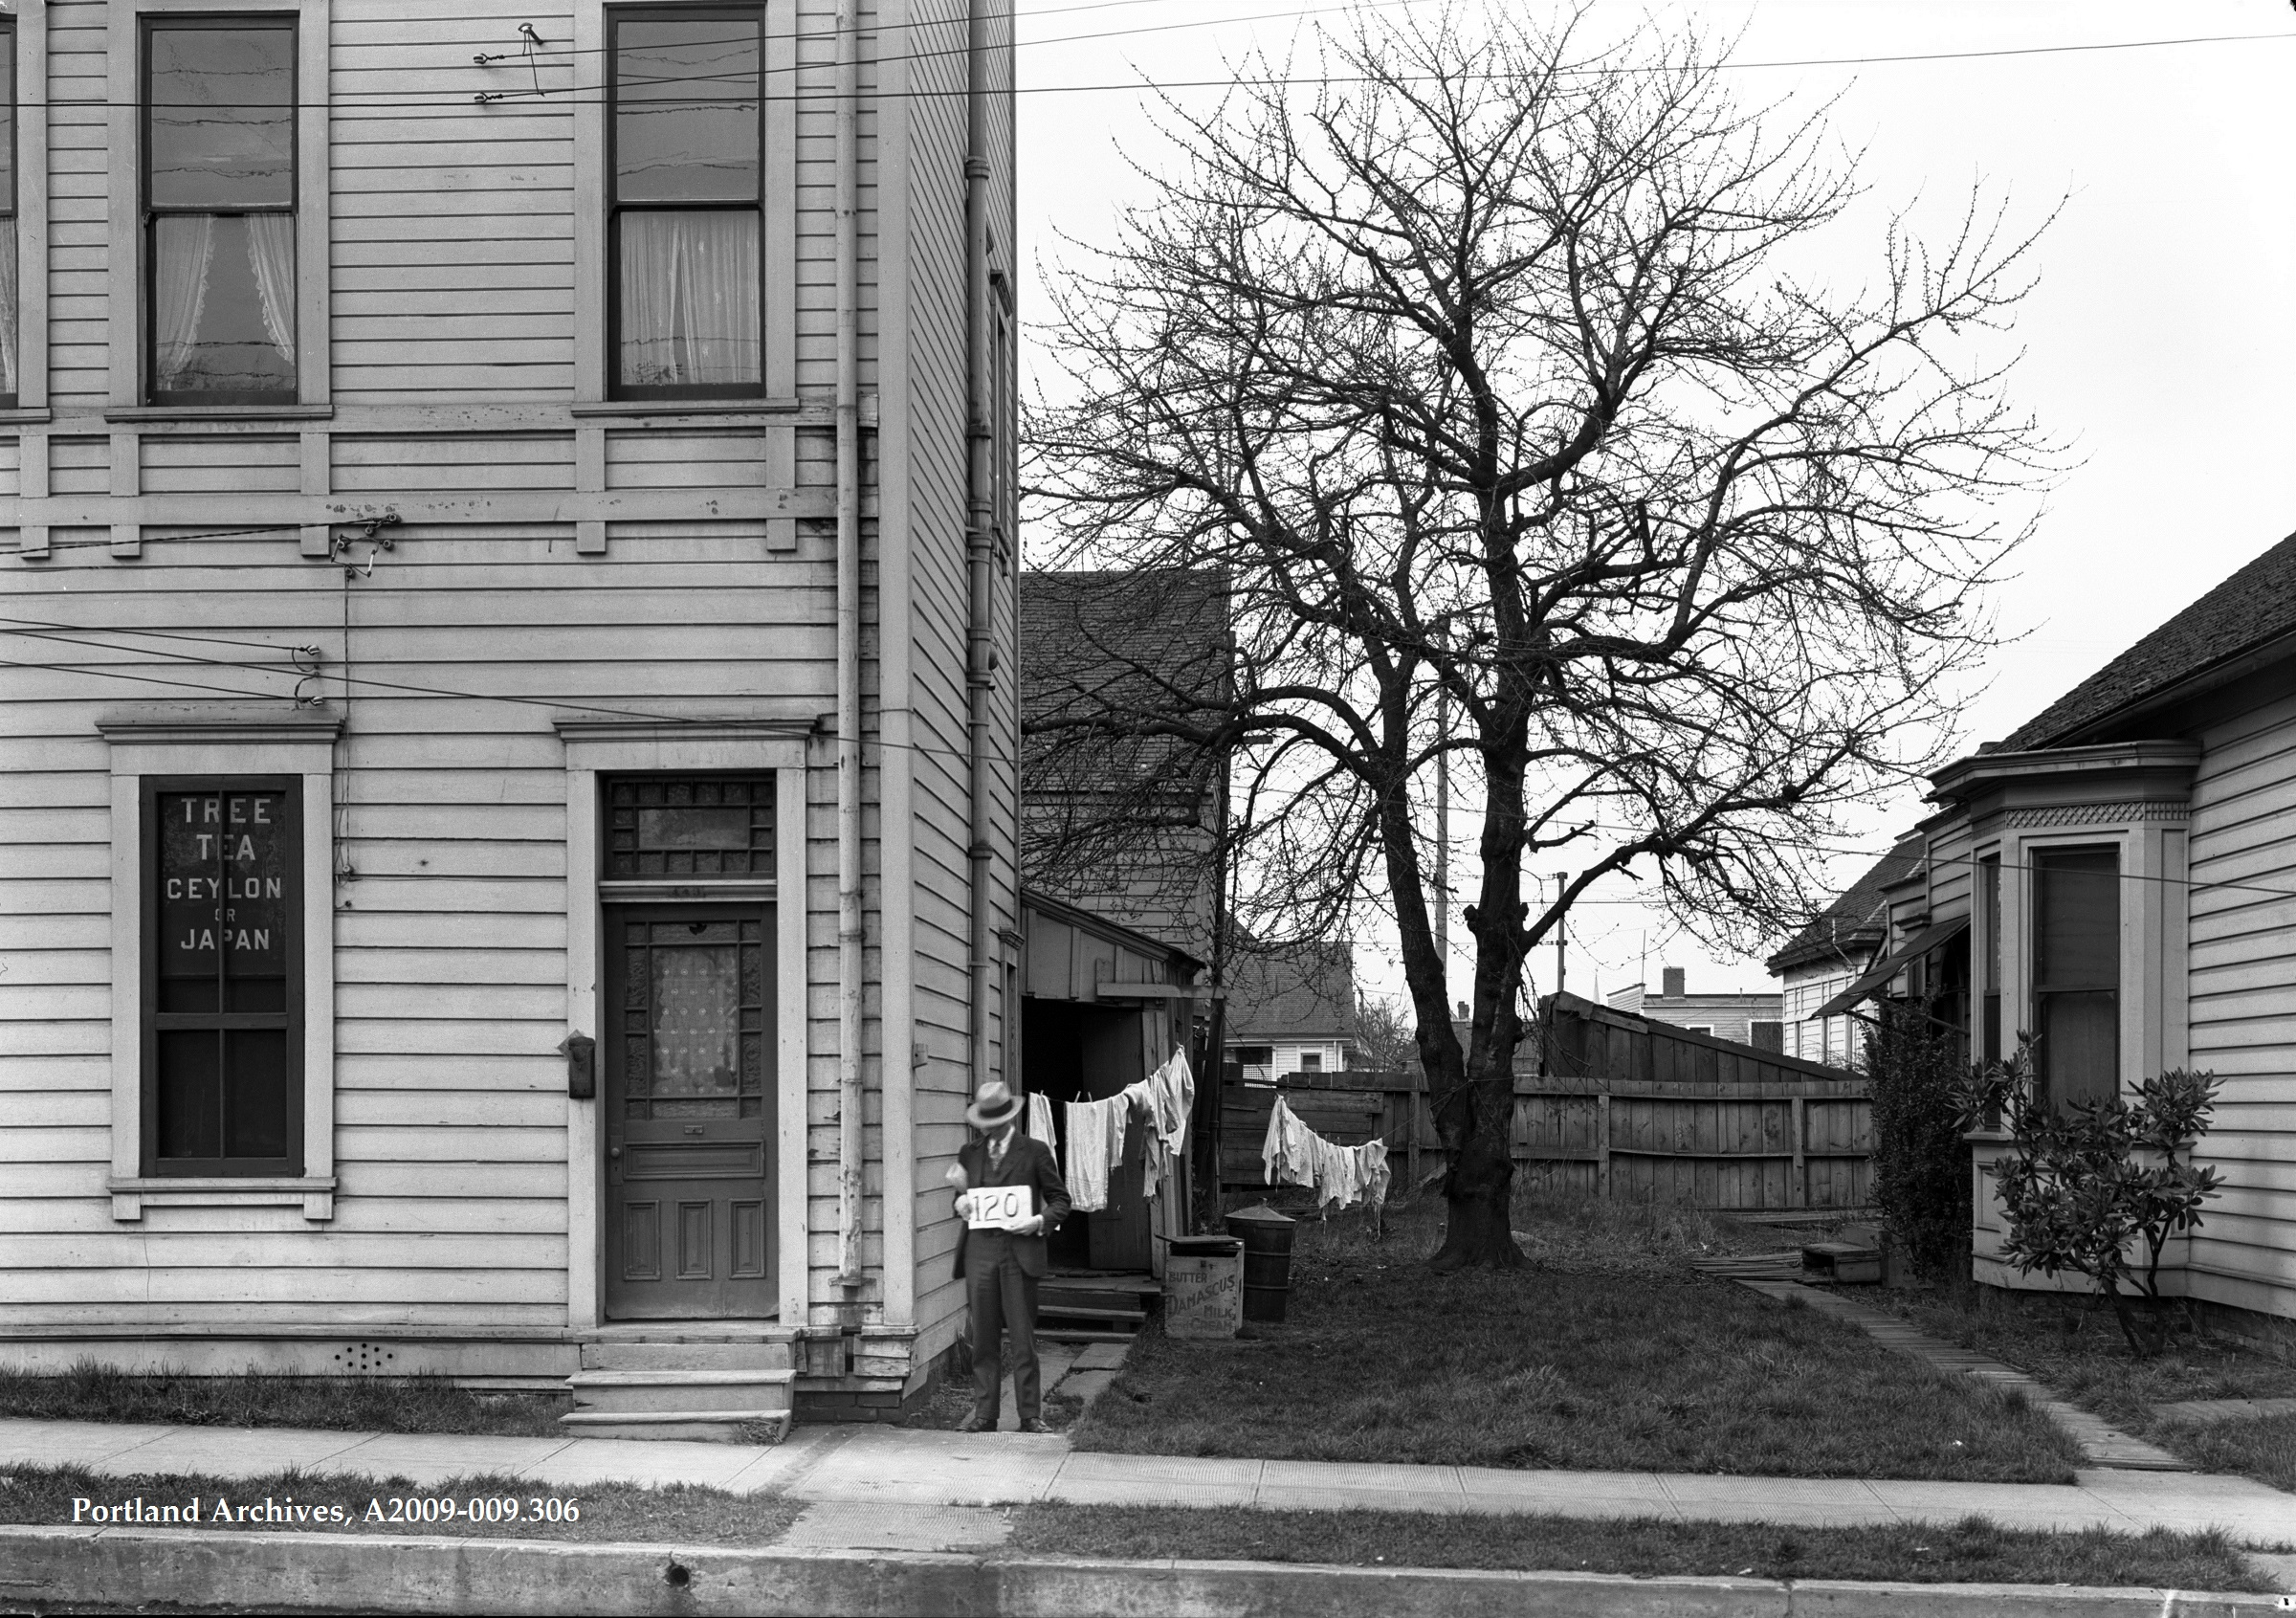 City of Portland Archives, Oregon, A2009-009.306